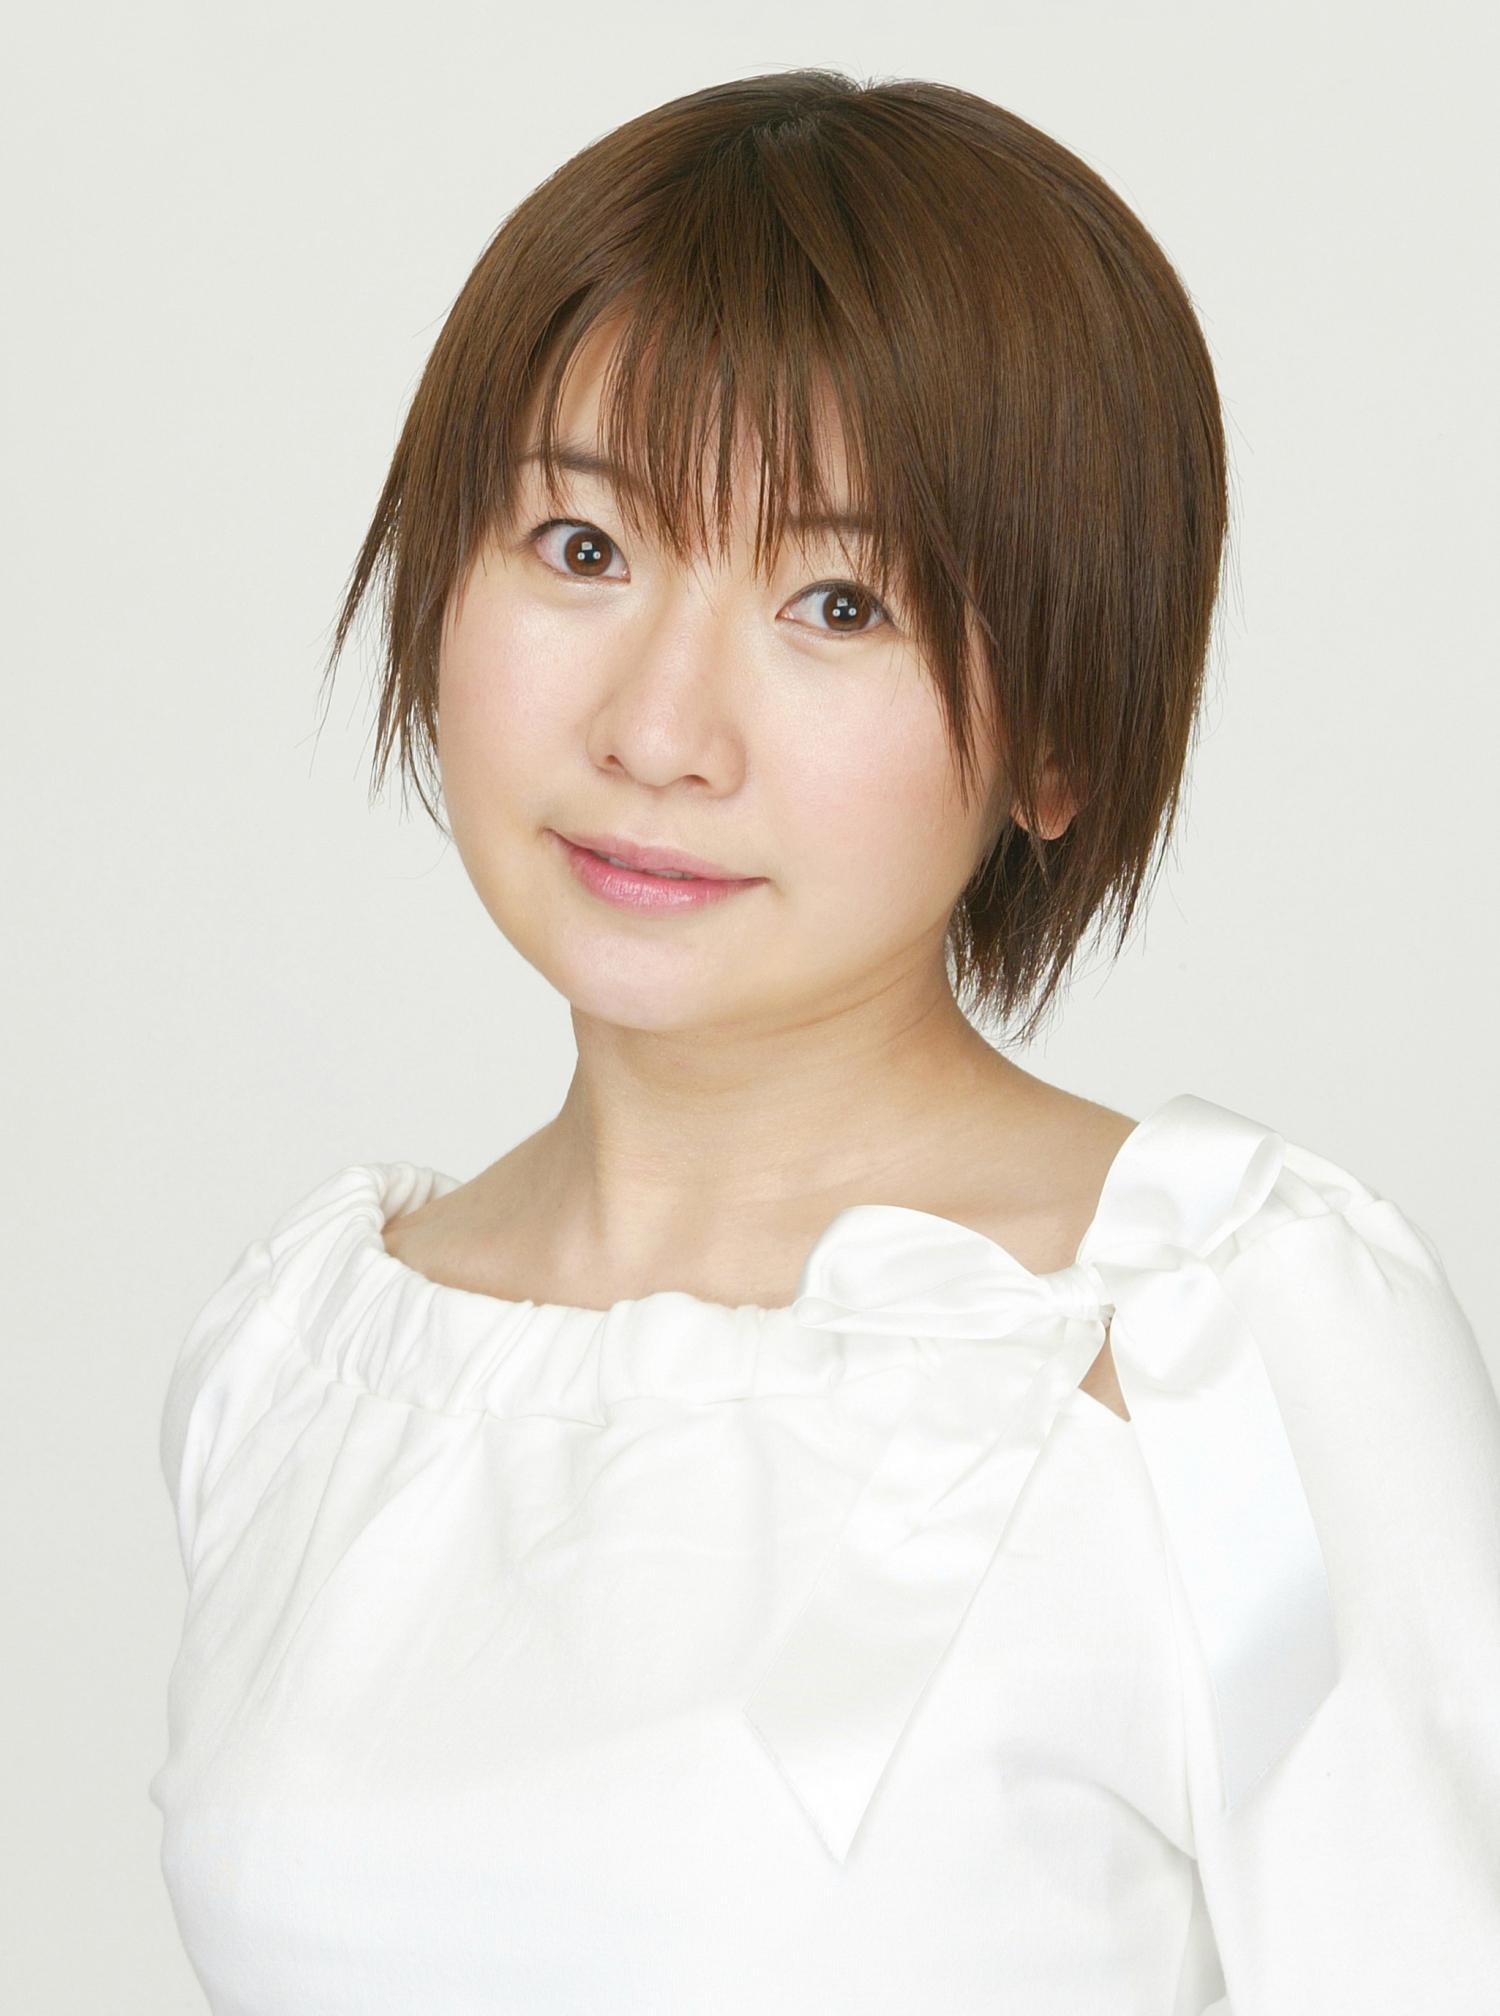 File:MiyuMatsuki.png